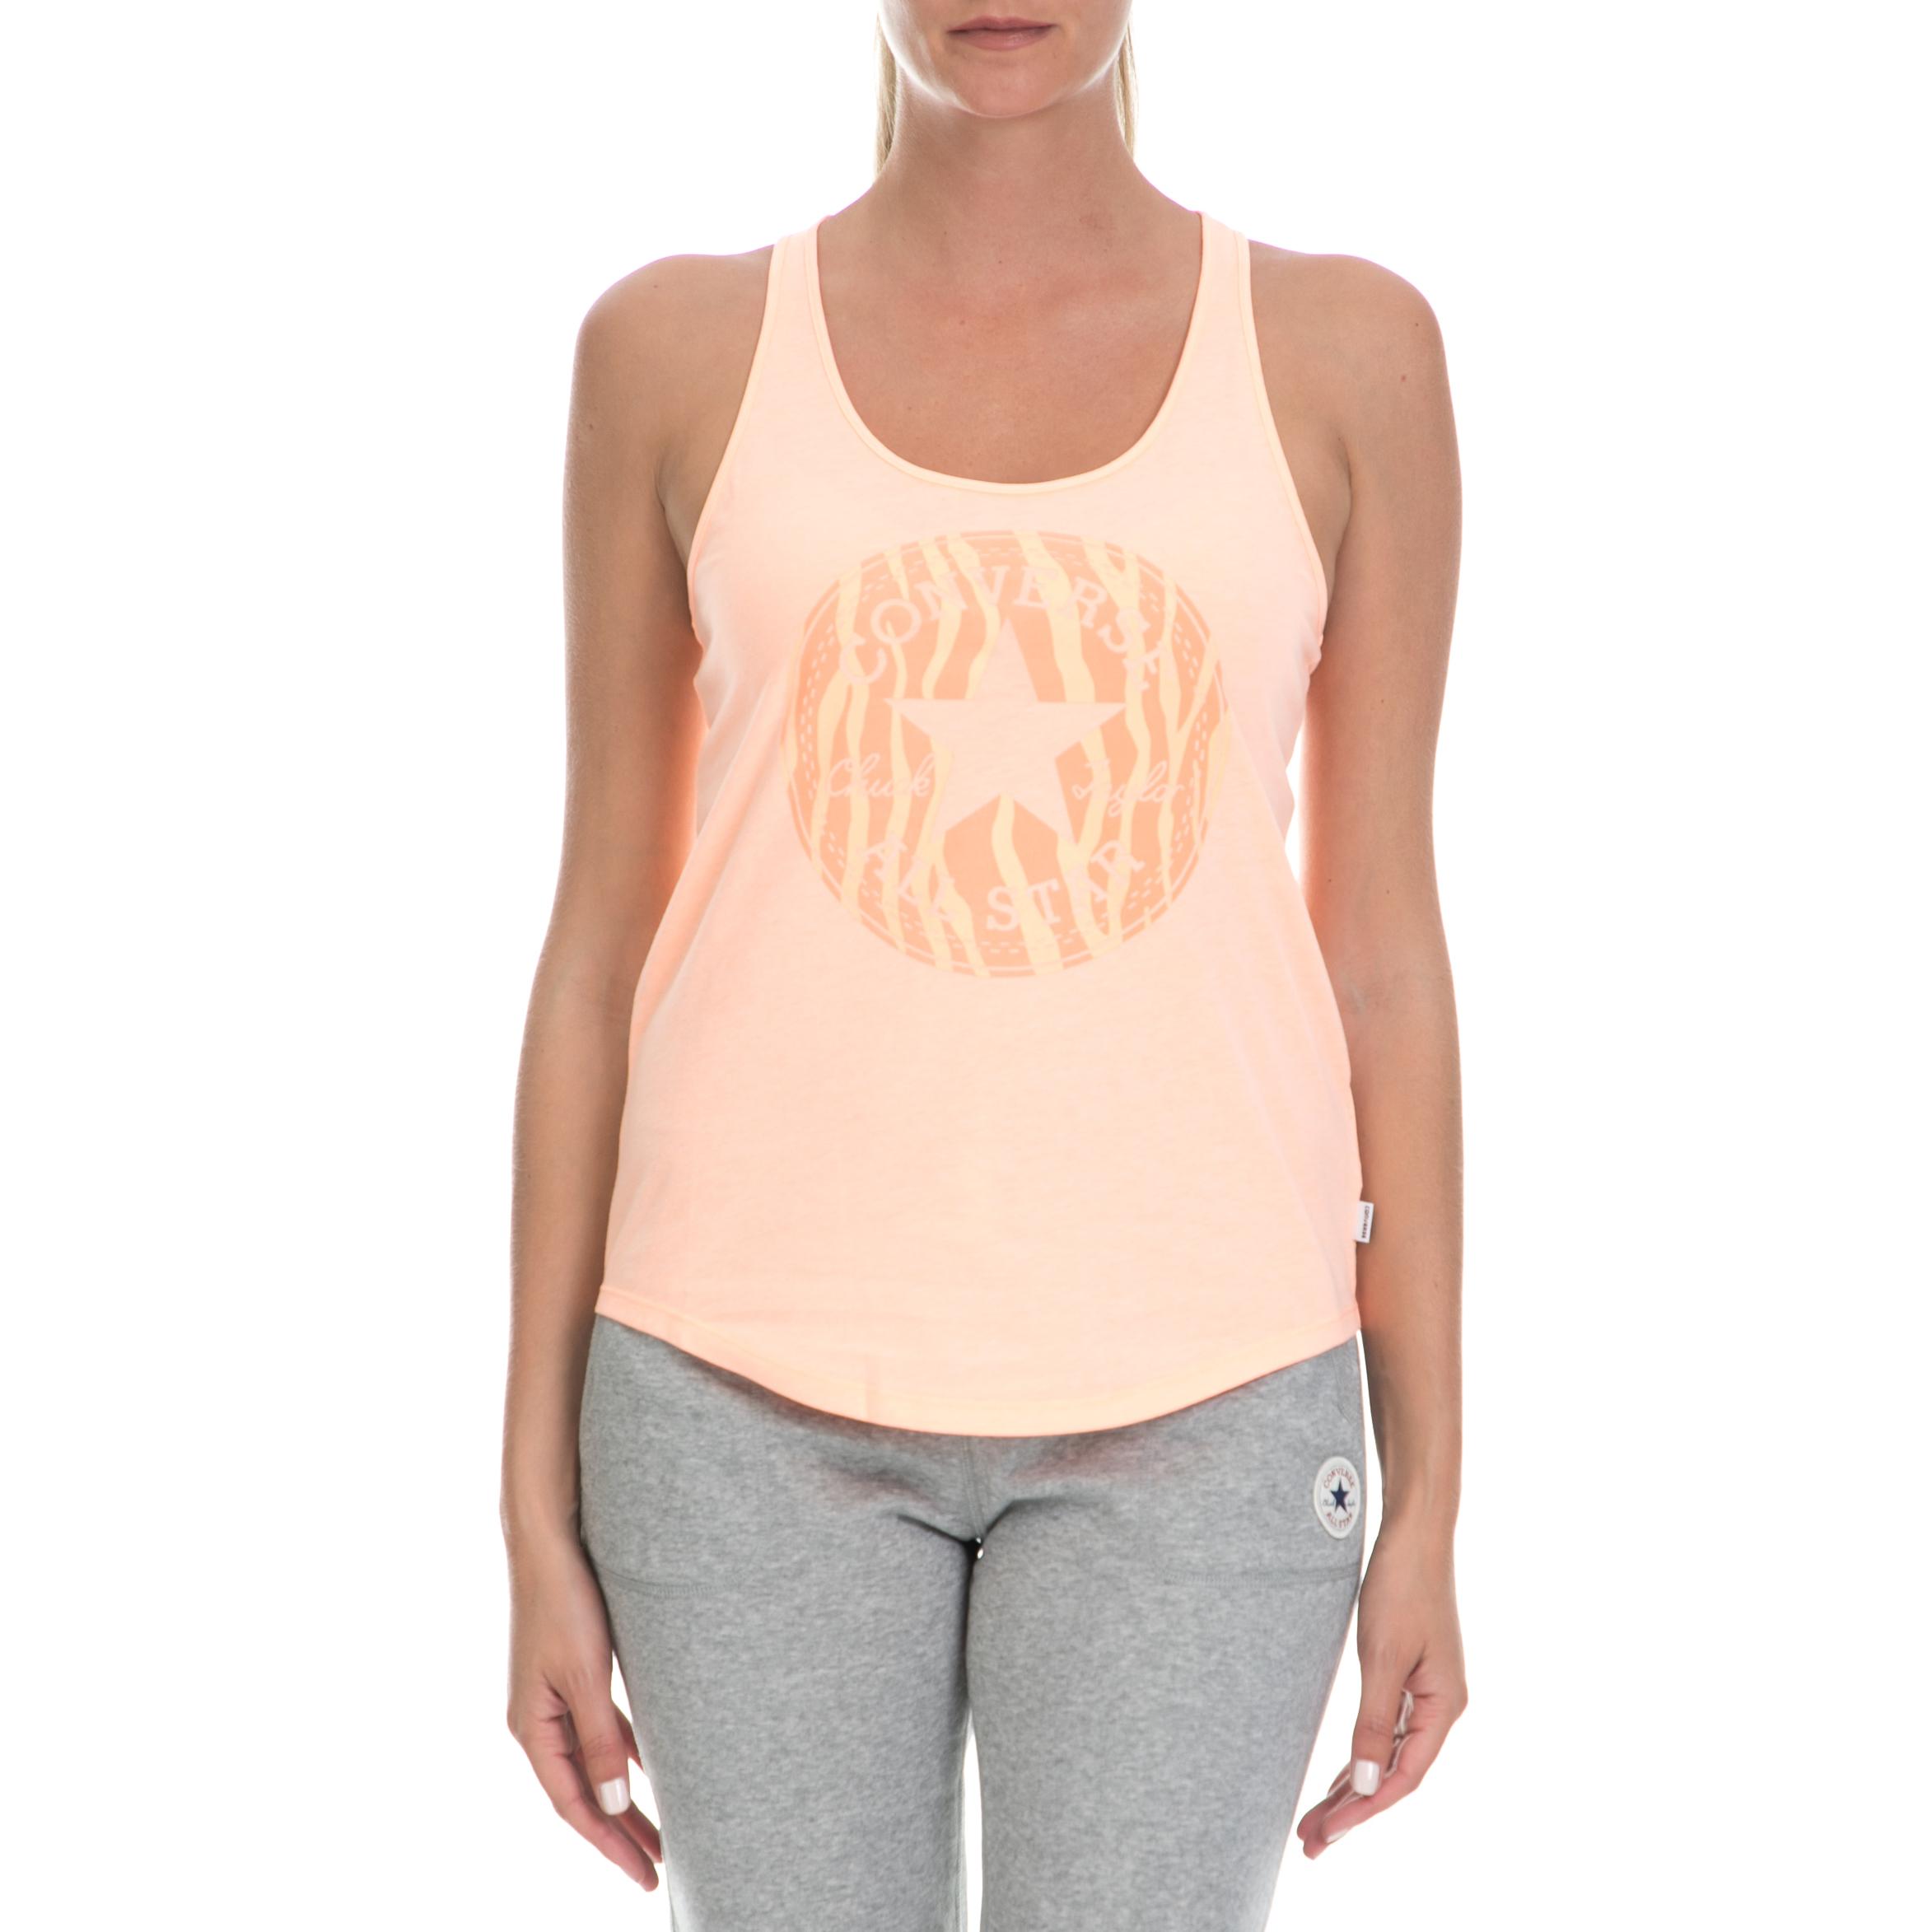 CONVERSE - Γυναικεία μπλούζα CONVERSE πορτοκαλί γυναικεία ρούχα αθλητικά t shirt τοπ